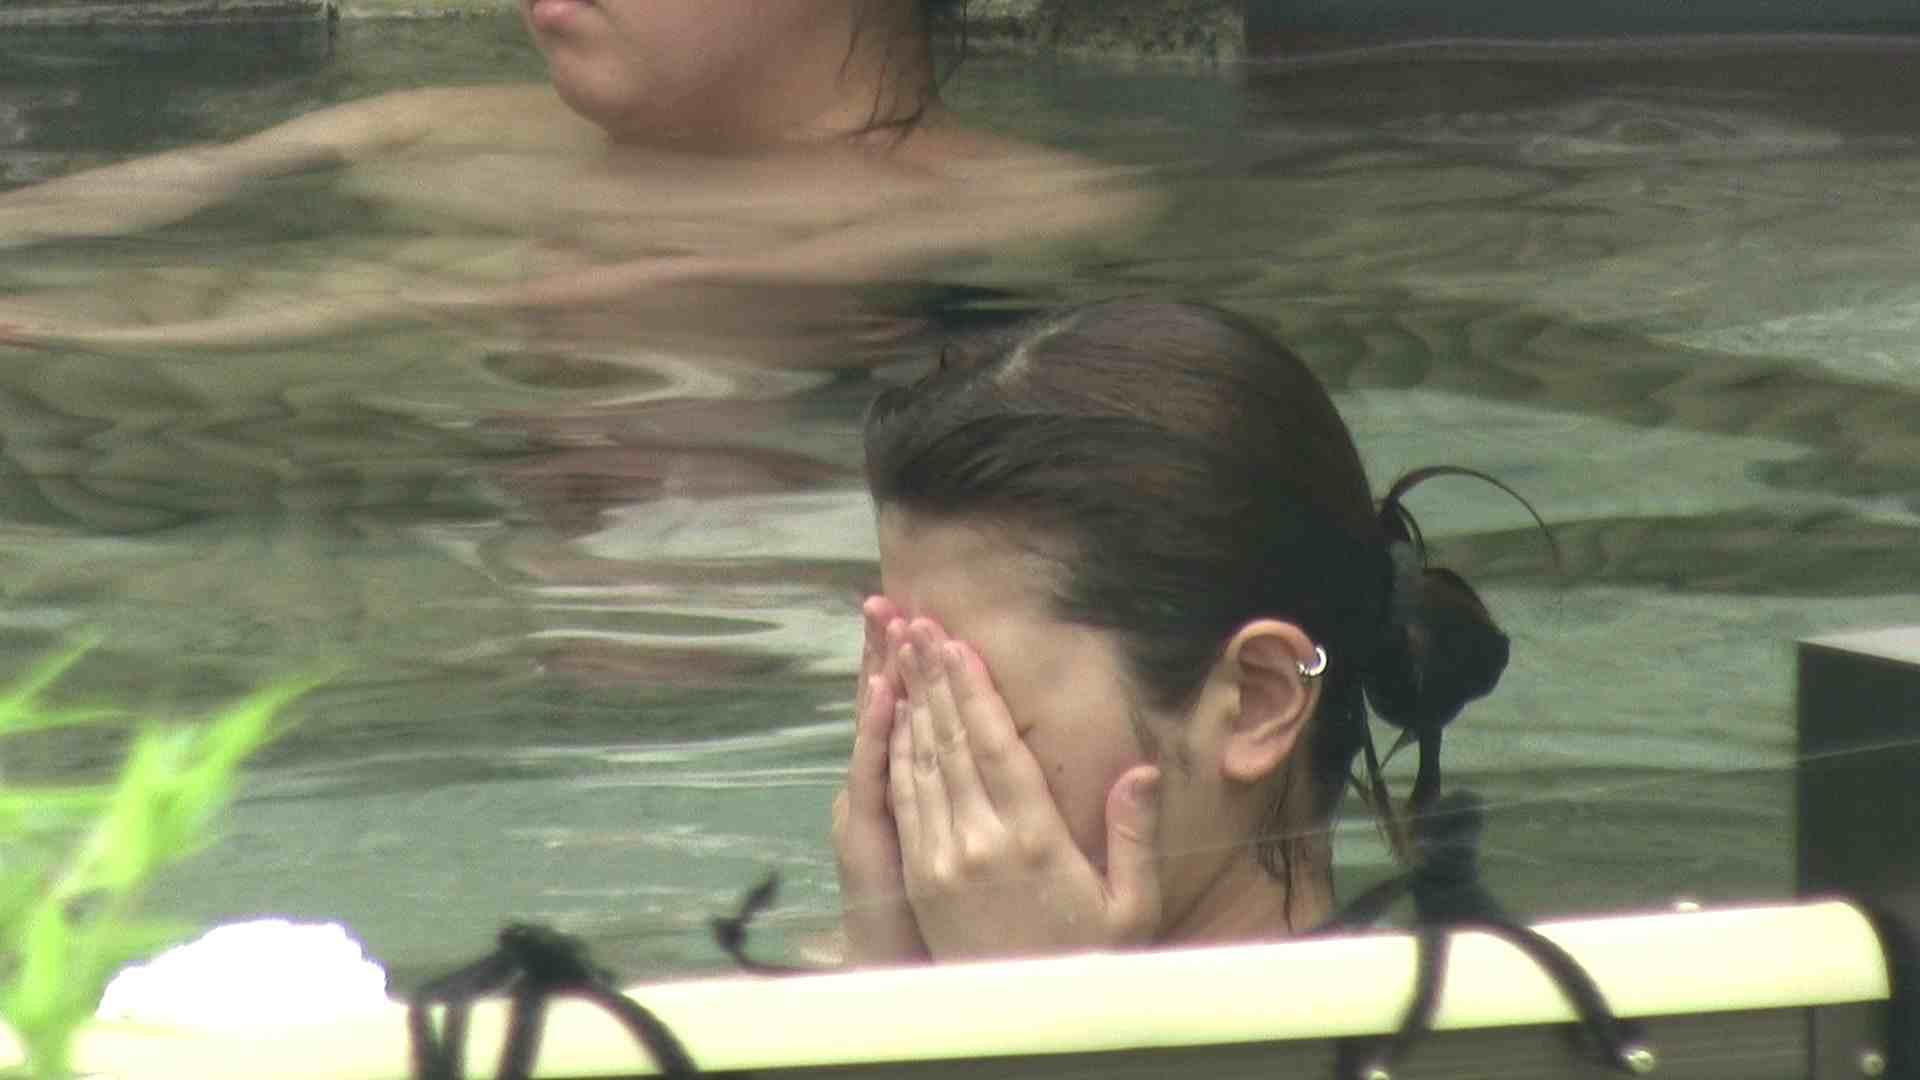 Aquaな露天風呂Vol.19【VIP】 盗撮 | HなOL  88pic 67